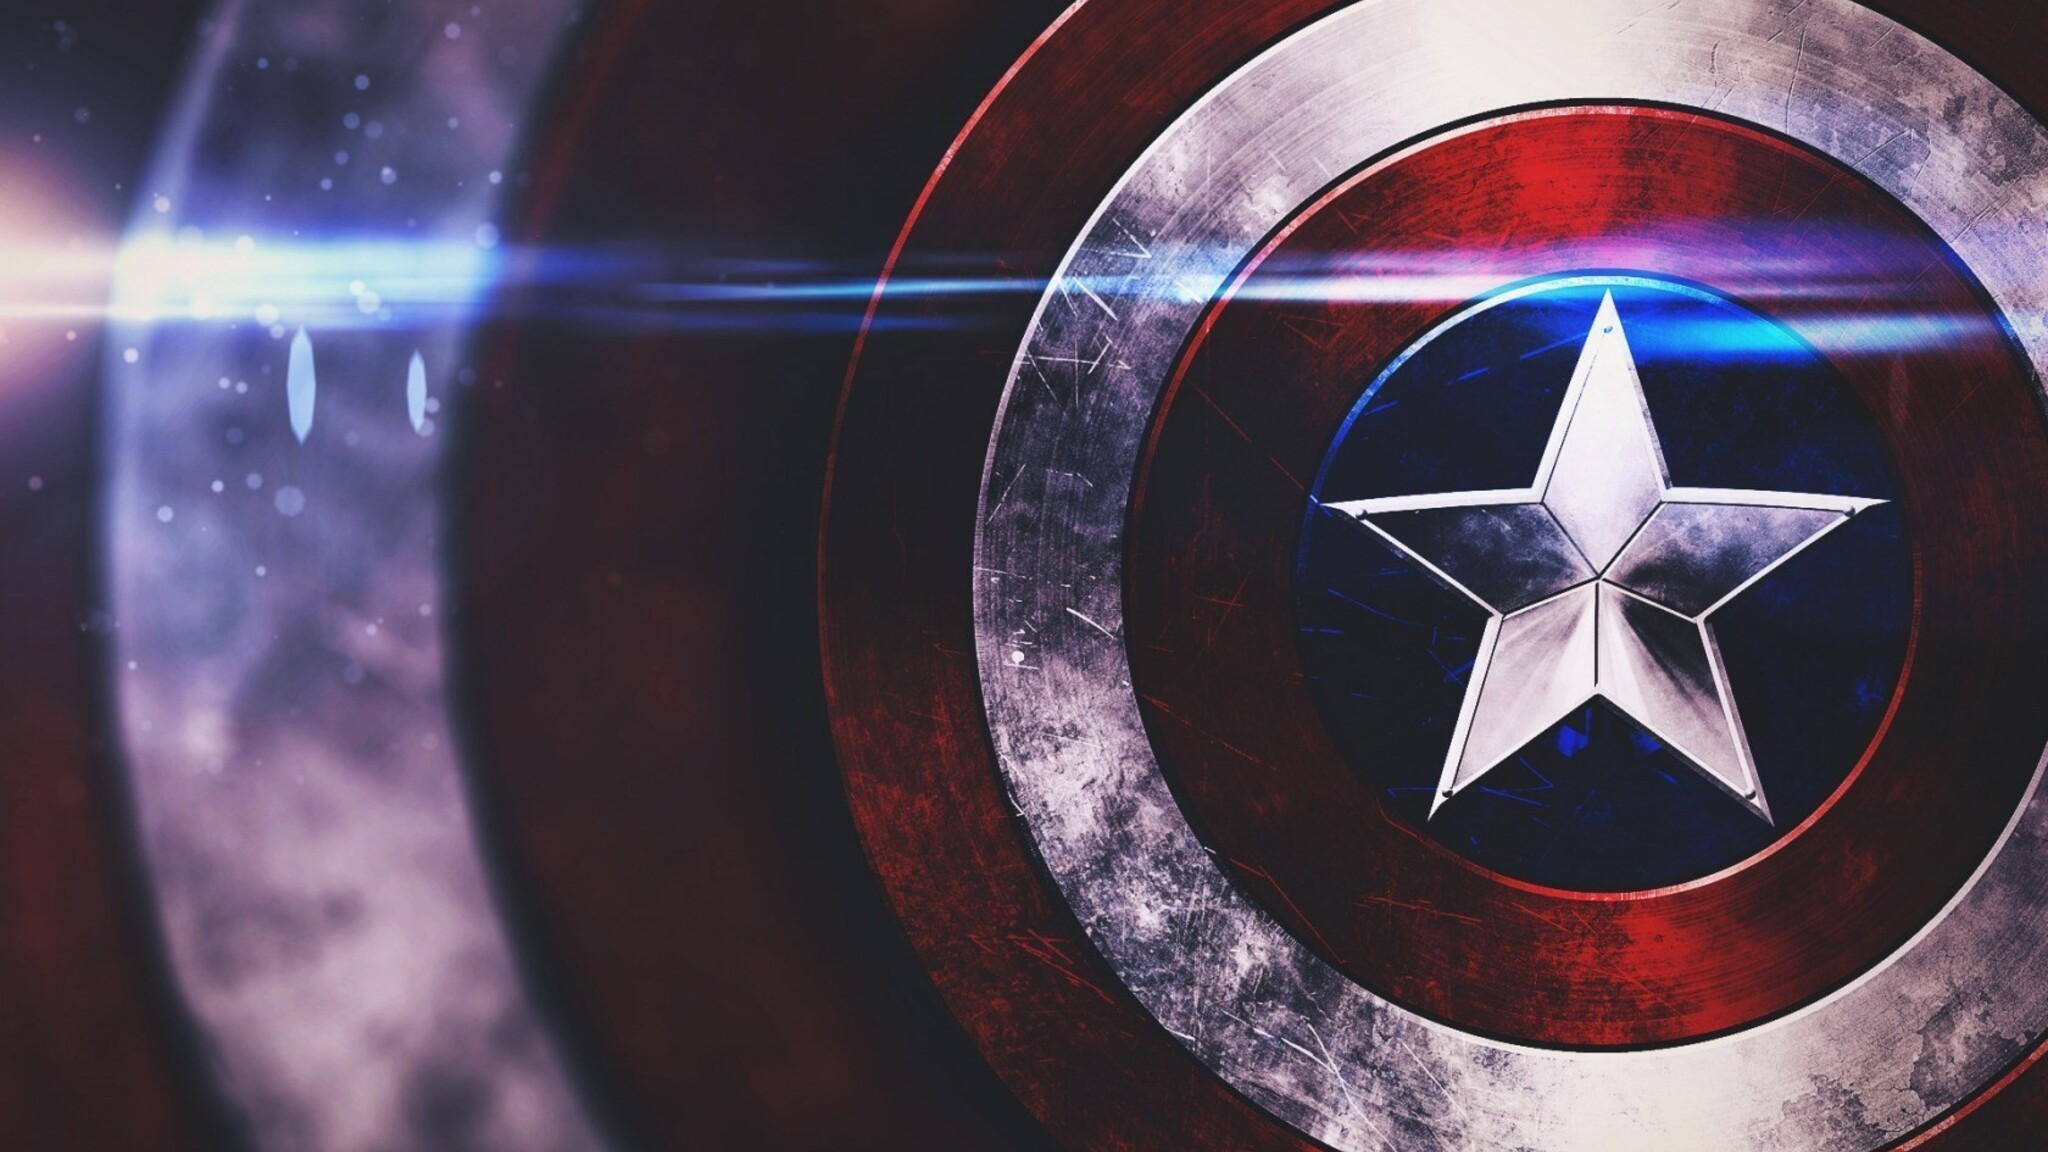 2048x1152 Captain America Shield 2048x1152 Resolution Hd 4k